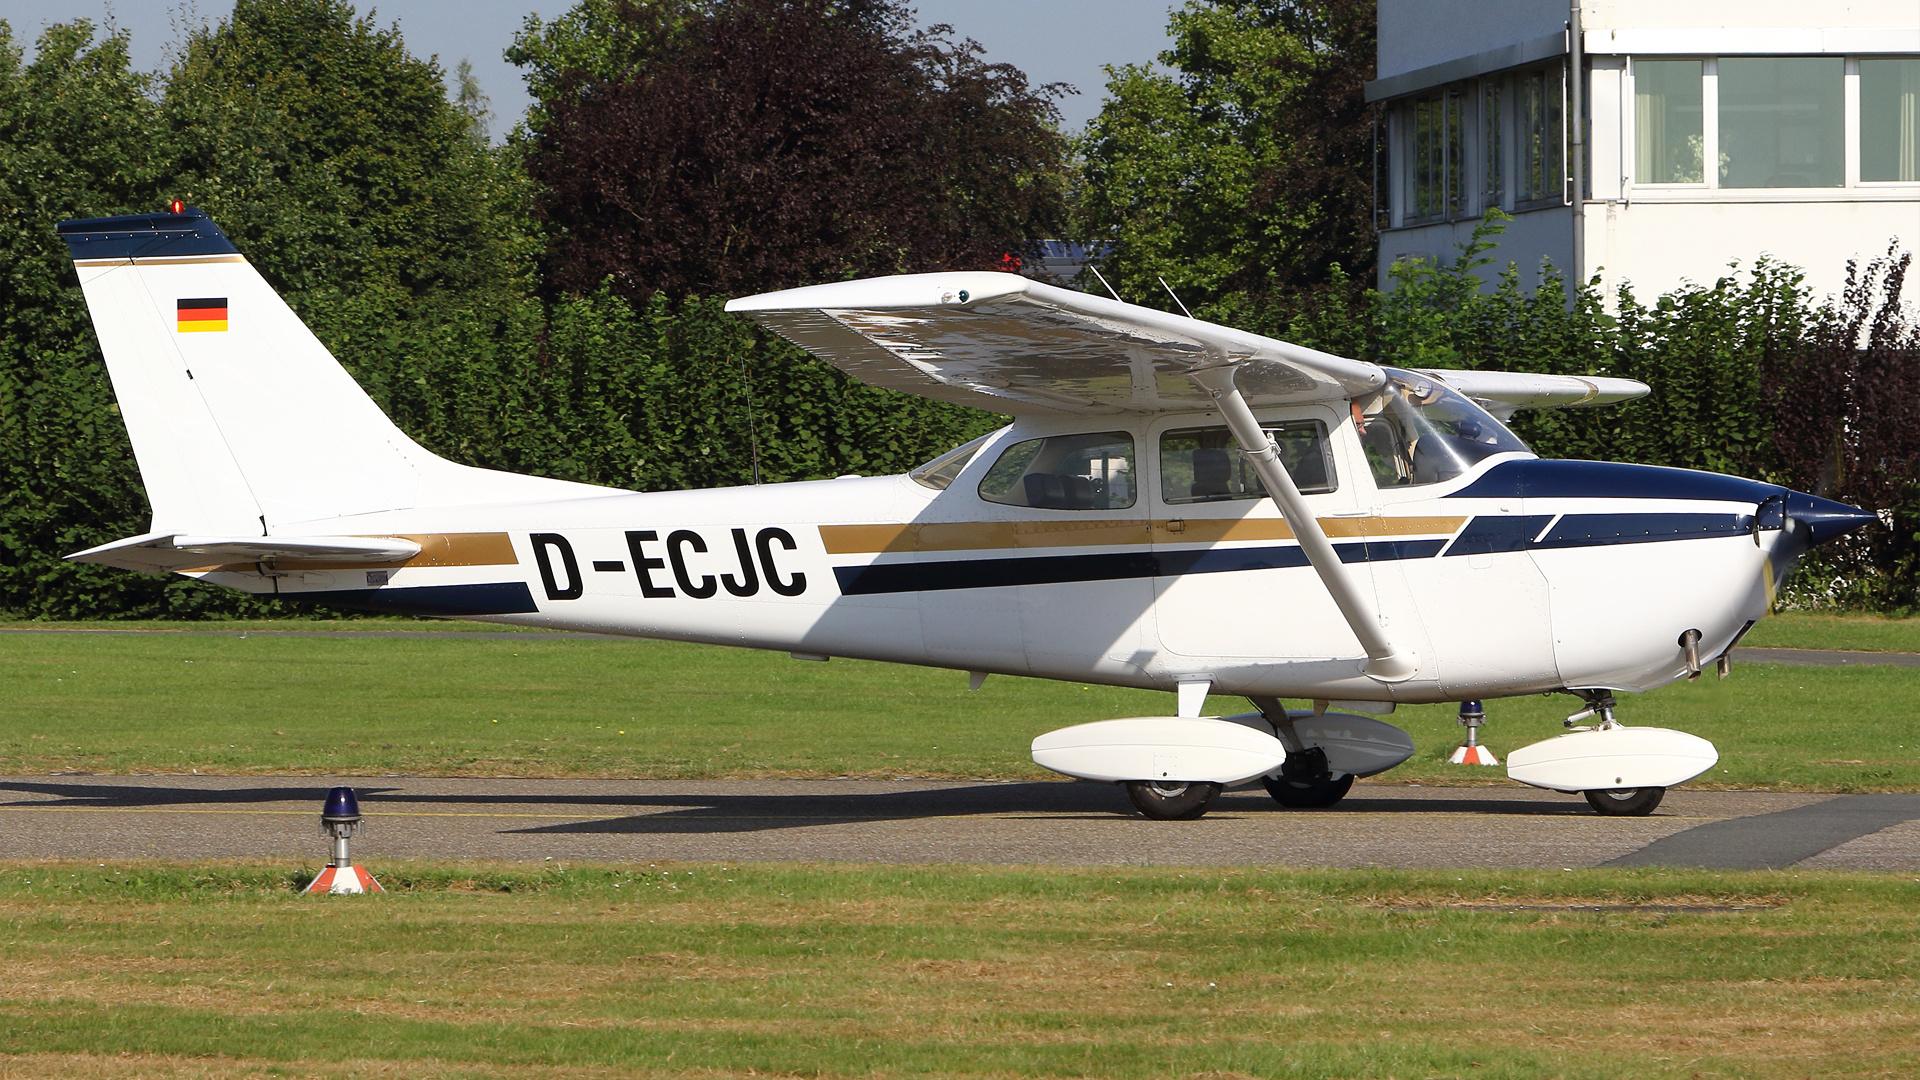 D-ECJC-1 C172 ESS 201609